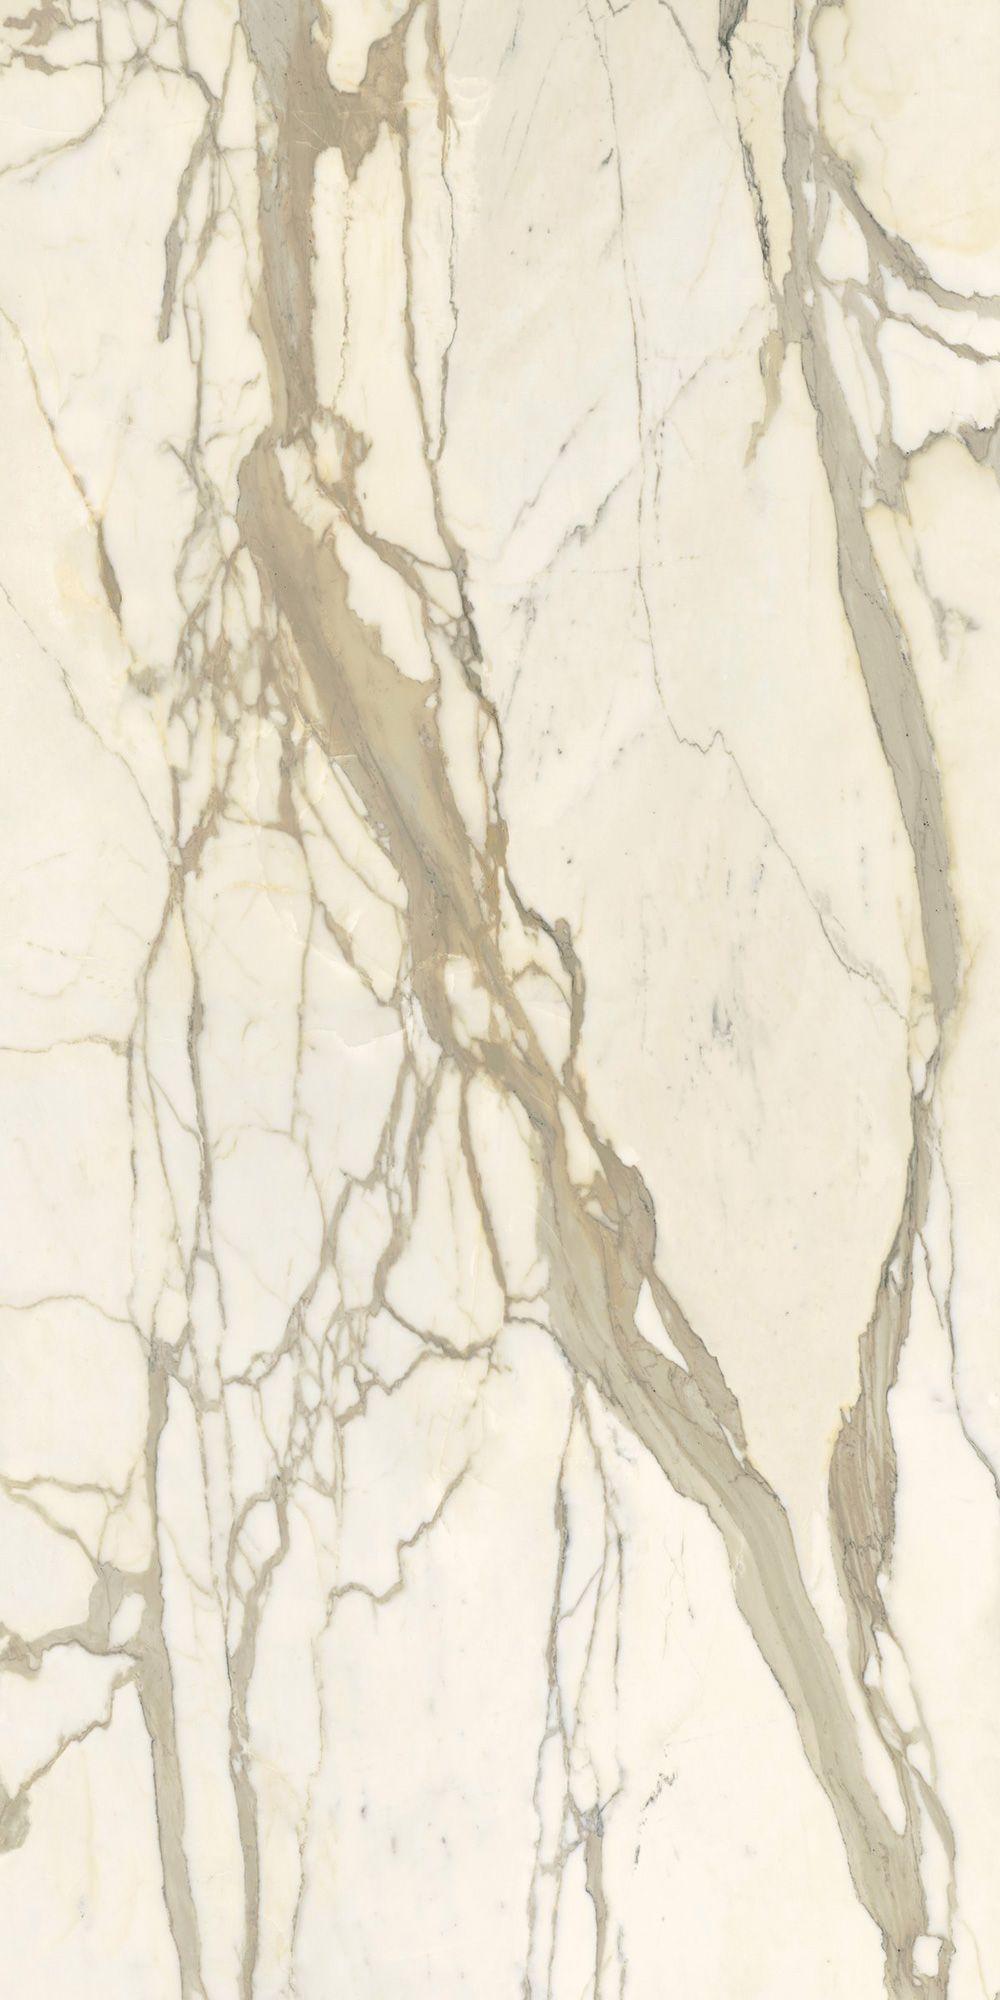 Porcelain stone tile marble floor tile mosaics and granite tiles porcelain stone tile marble floor tile mosaics and granite tiles for indoor and outdoor dailygadgetfo Images